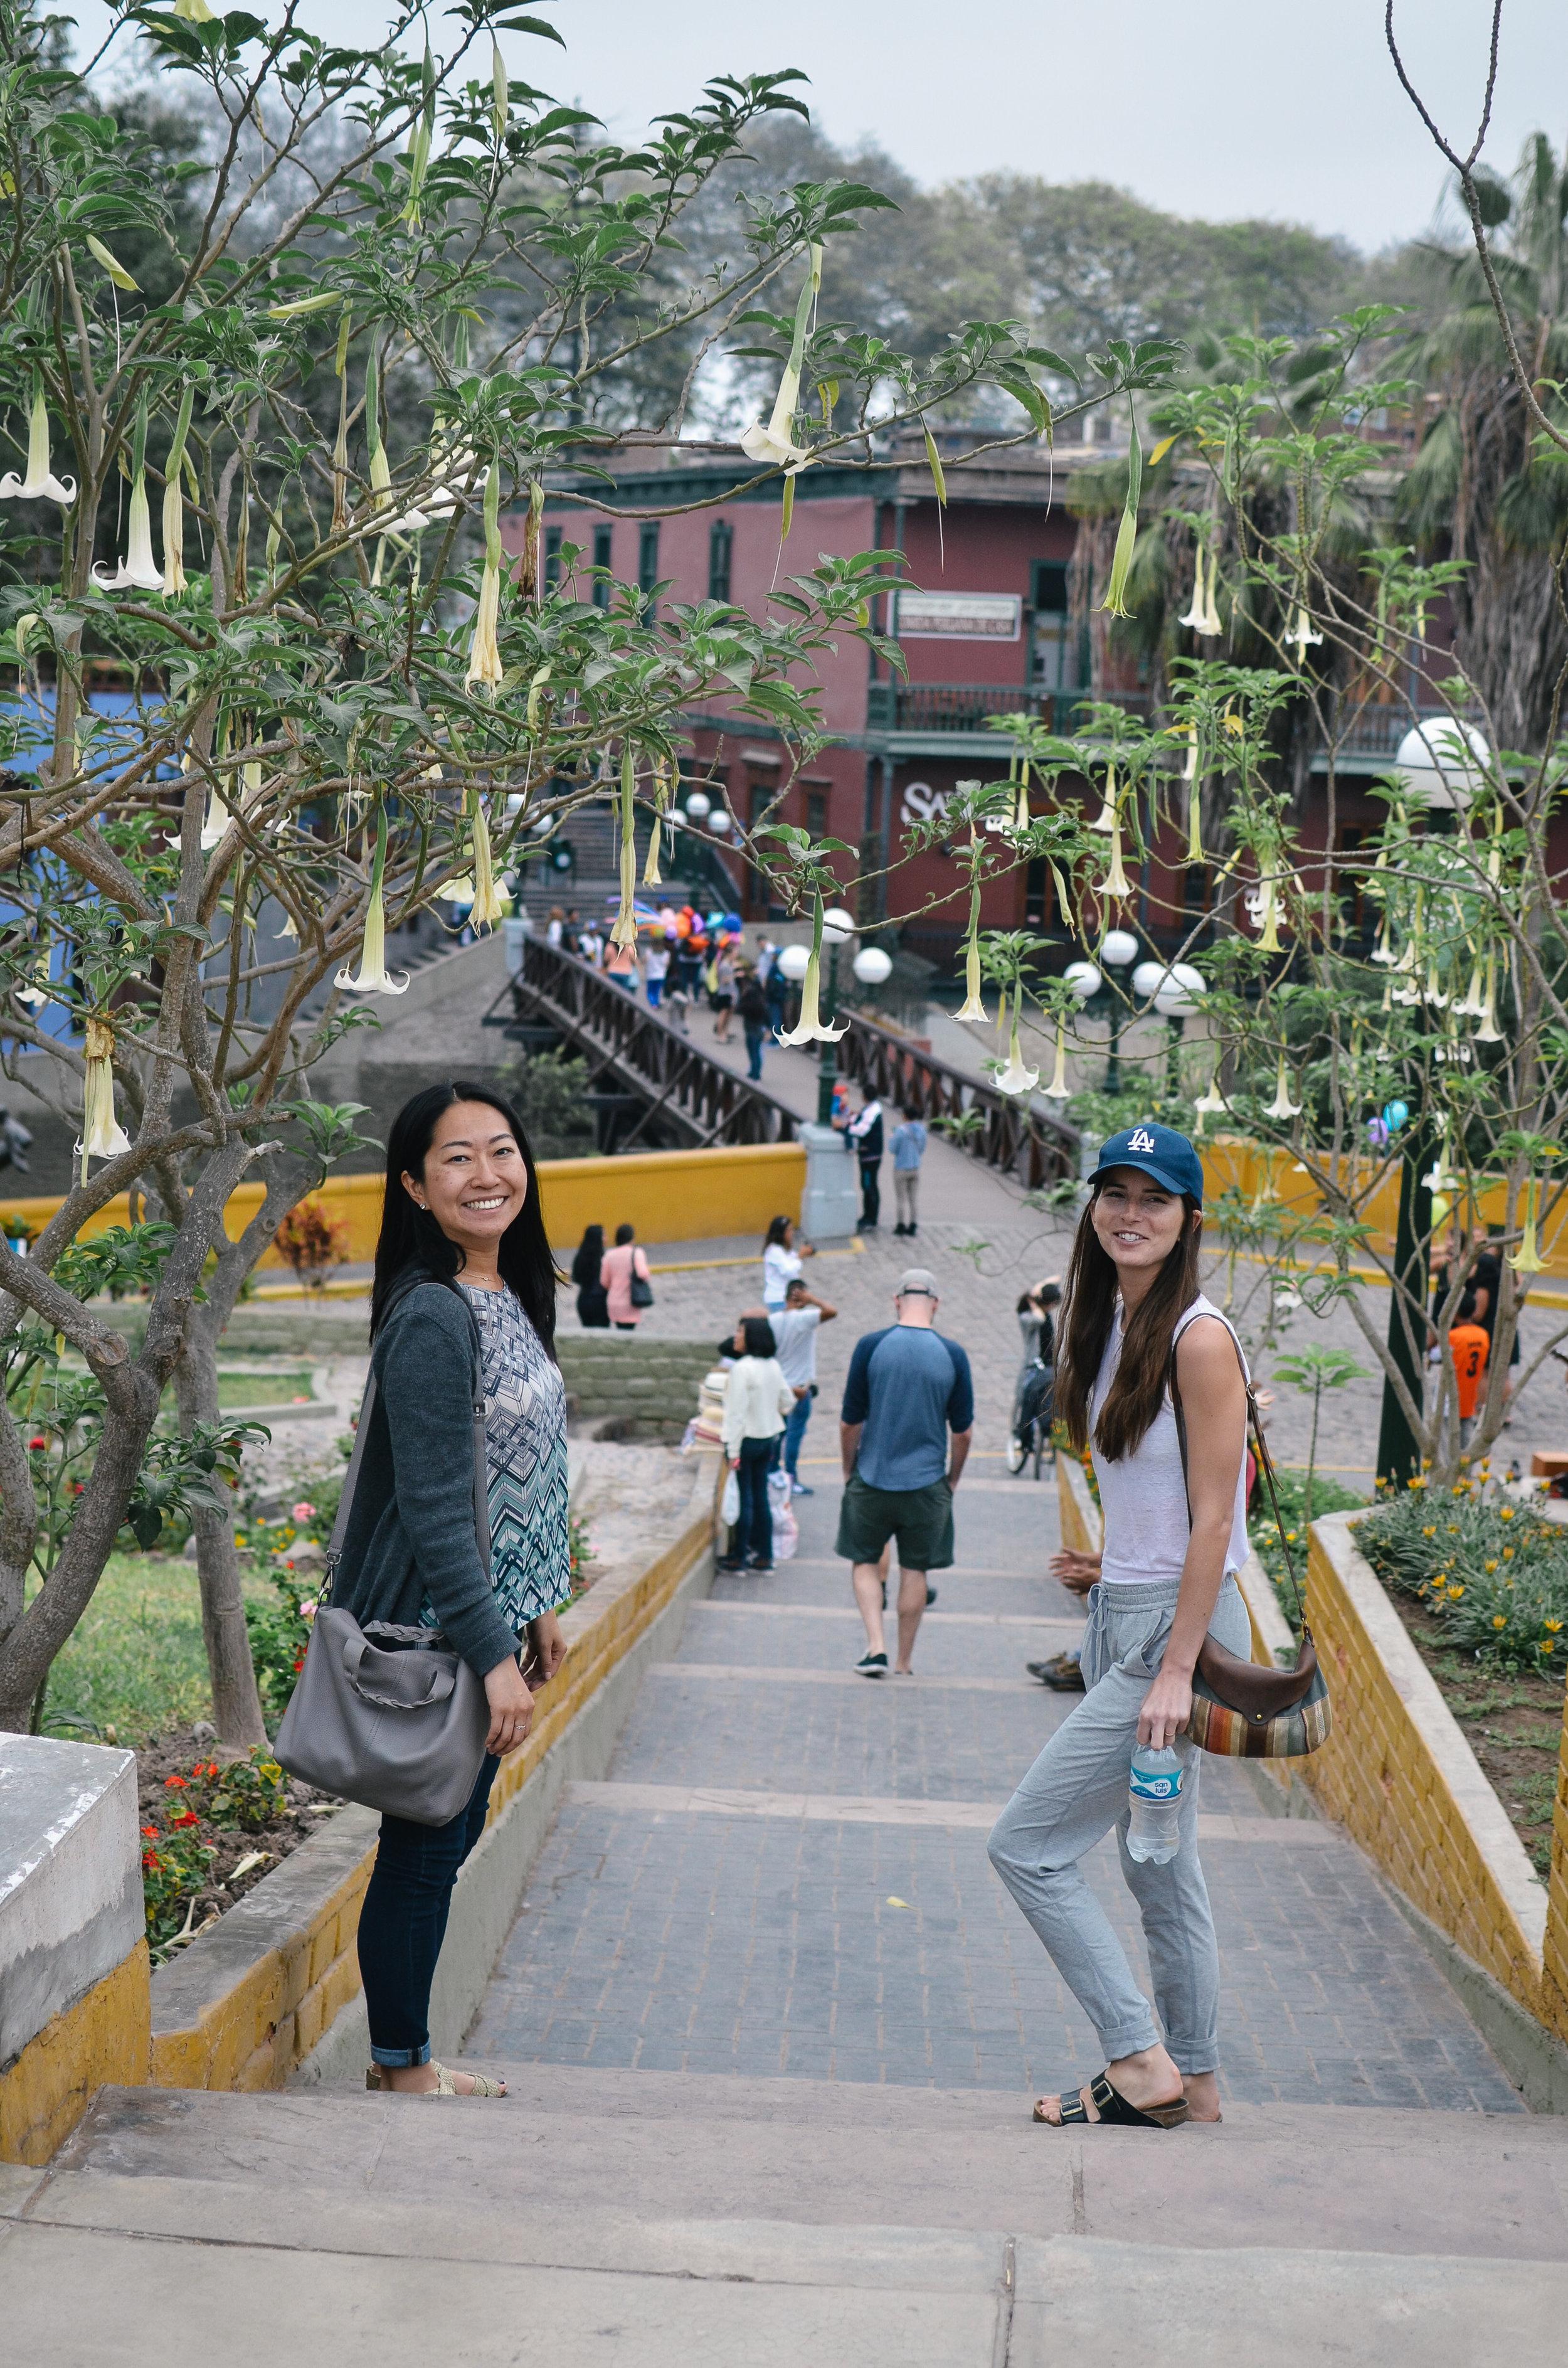 lima+peru+travel+guide+life+on+pine+blog +exchange_DSC_0065.jpg